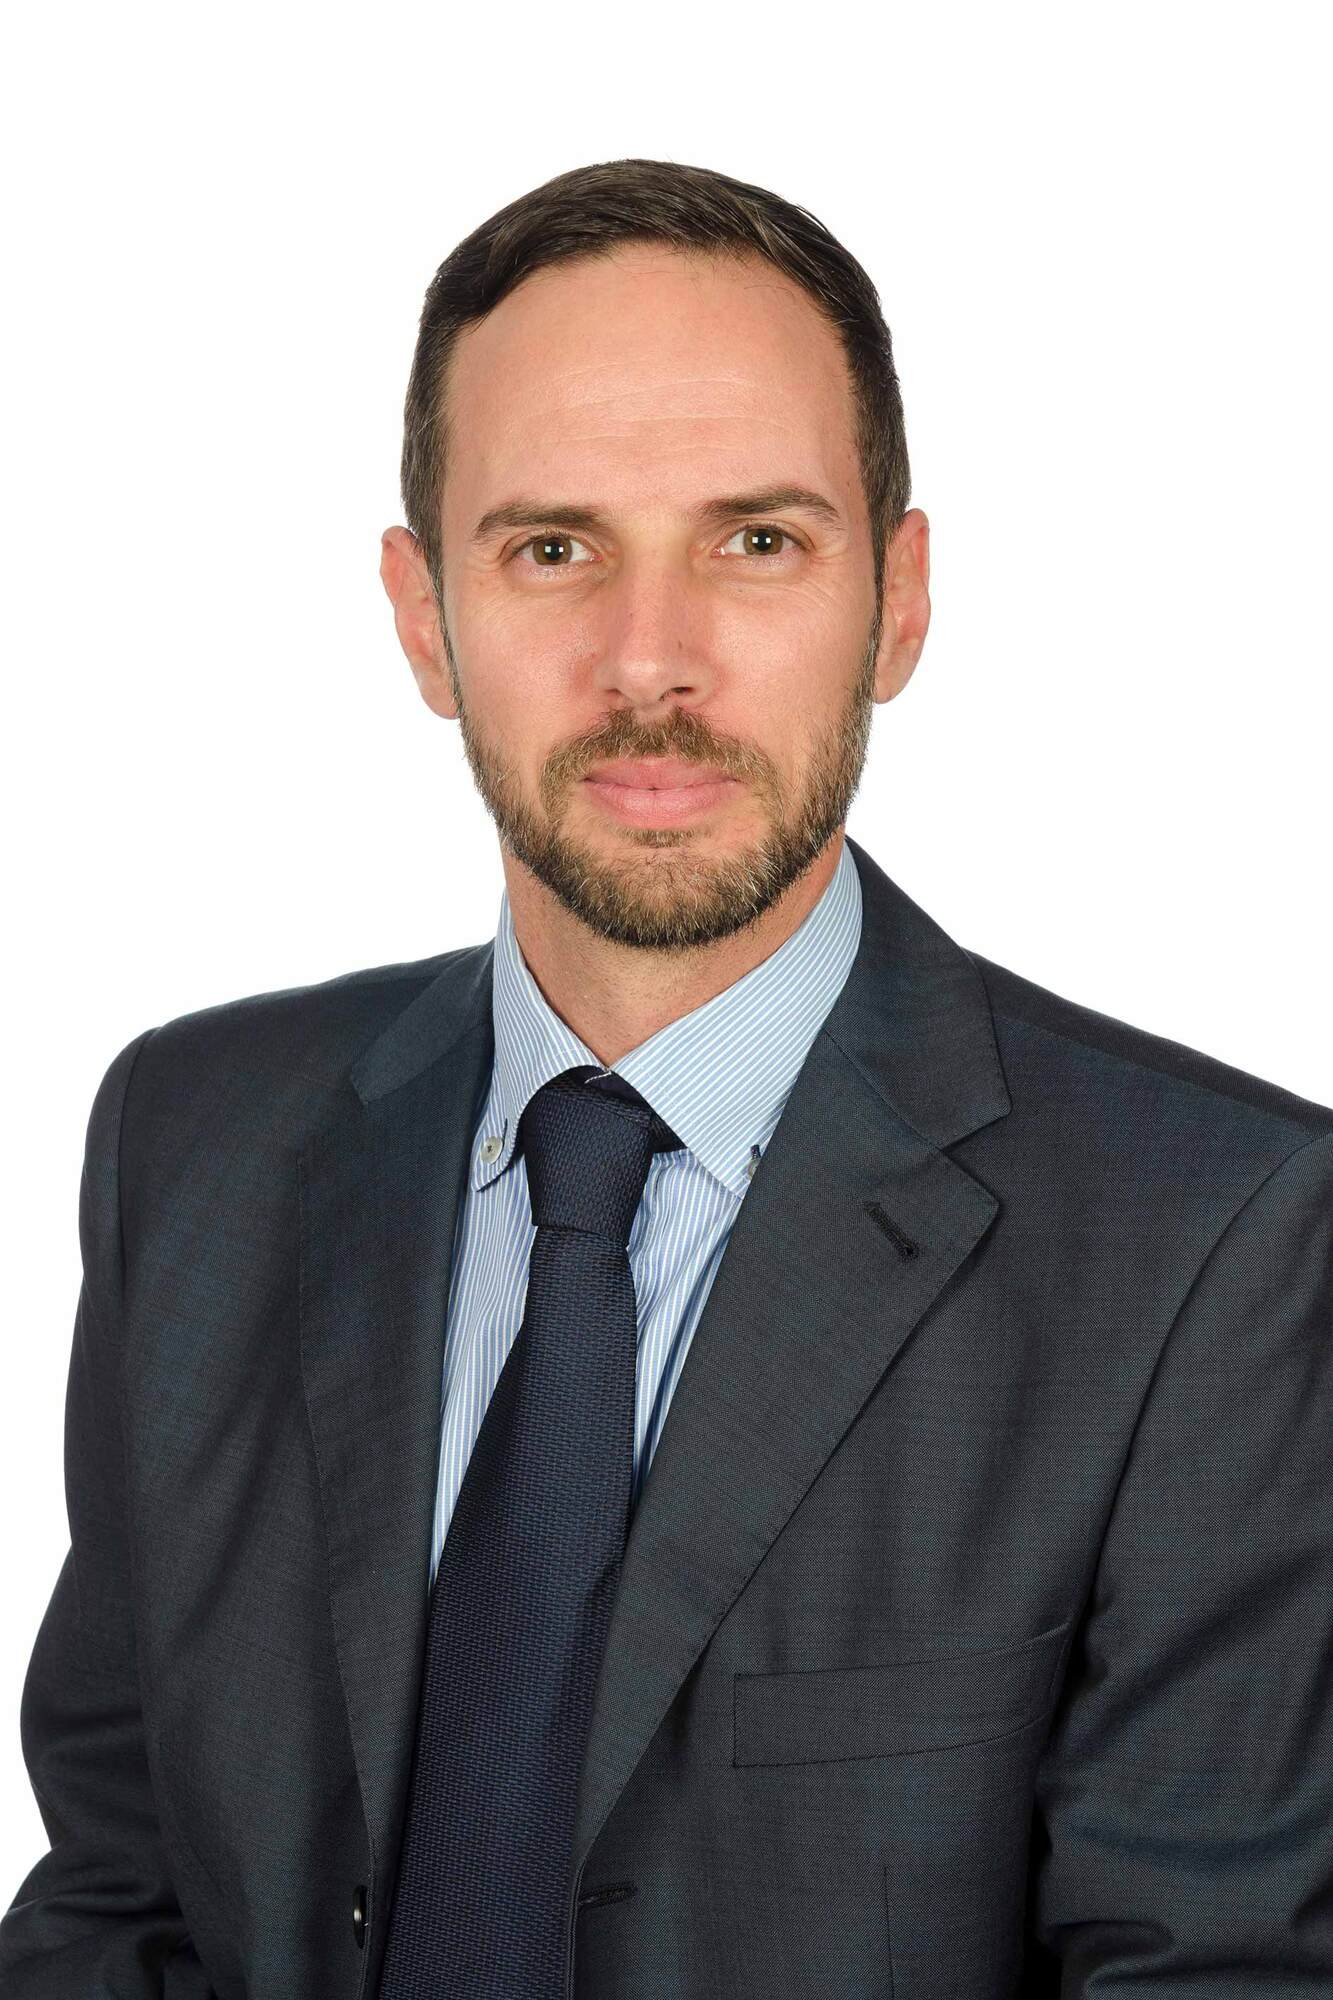 Aitor Cabrera Ugarte